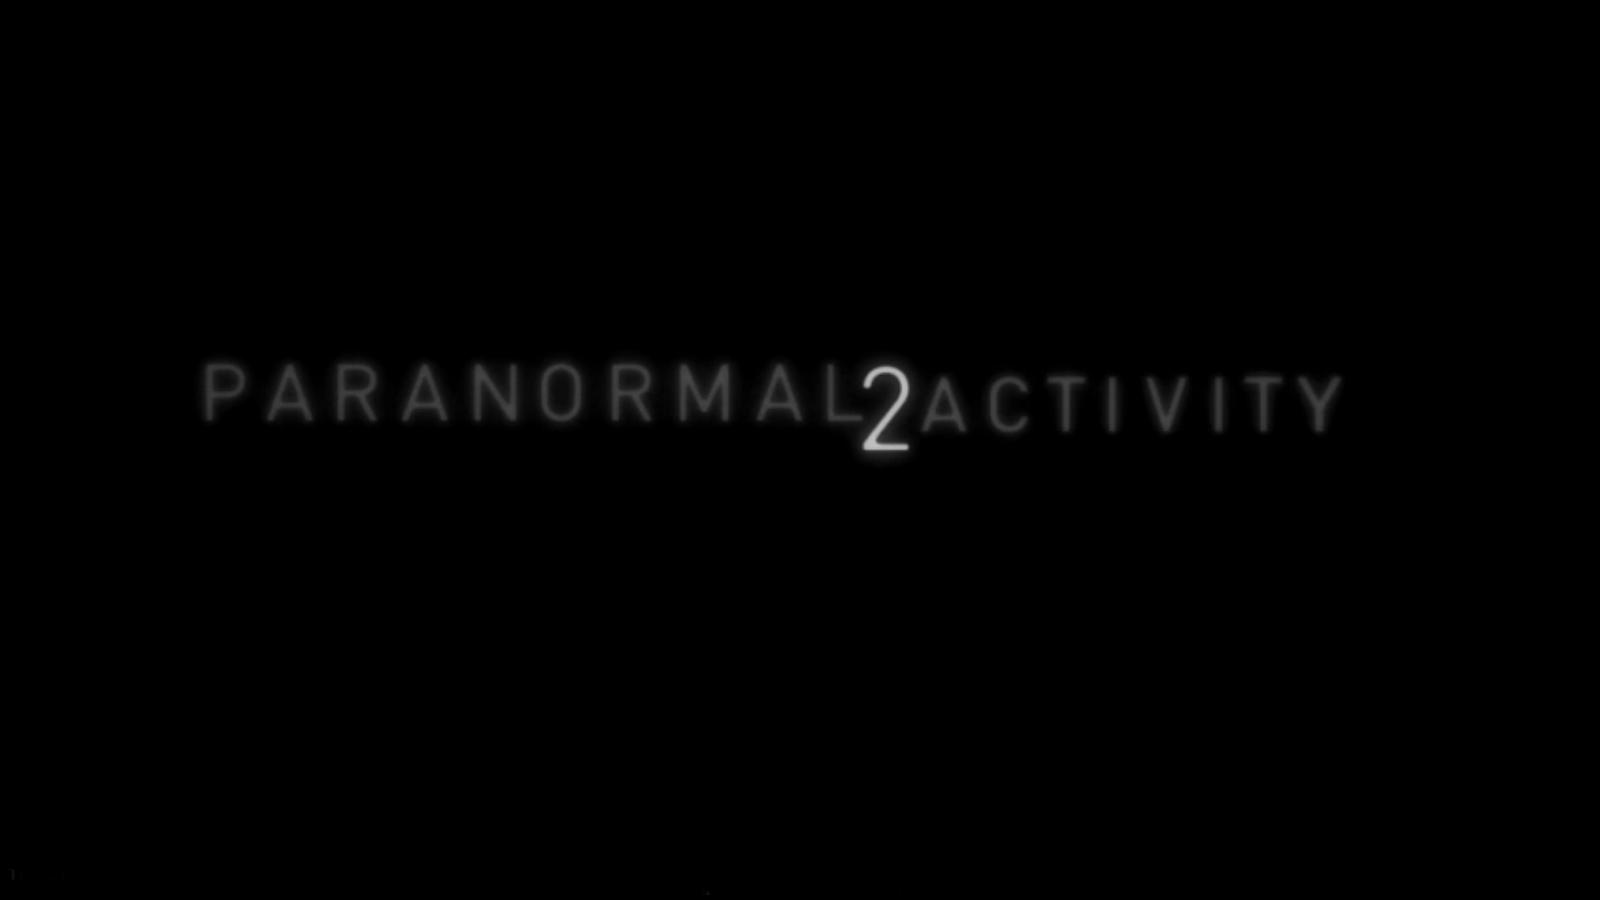 Here's the teaser trailer for